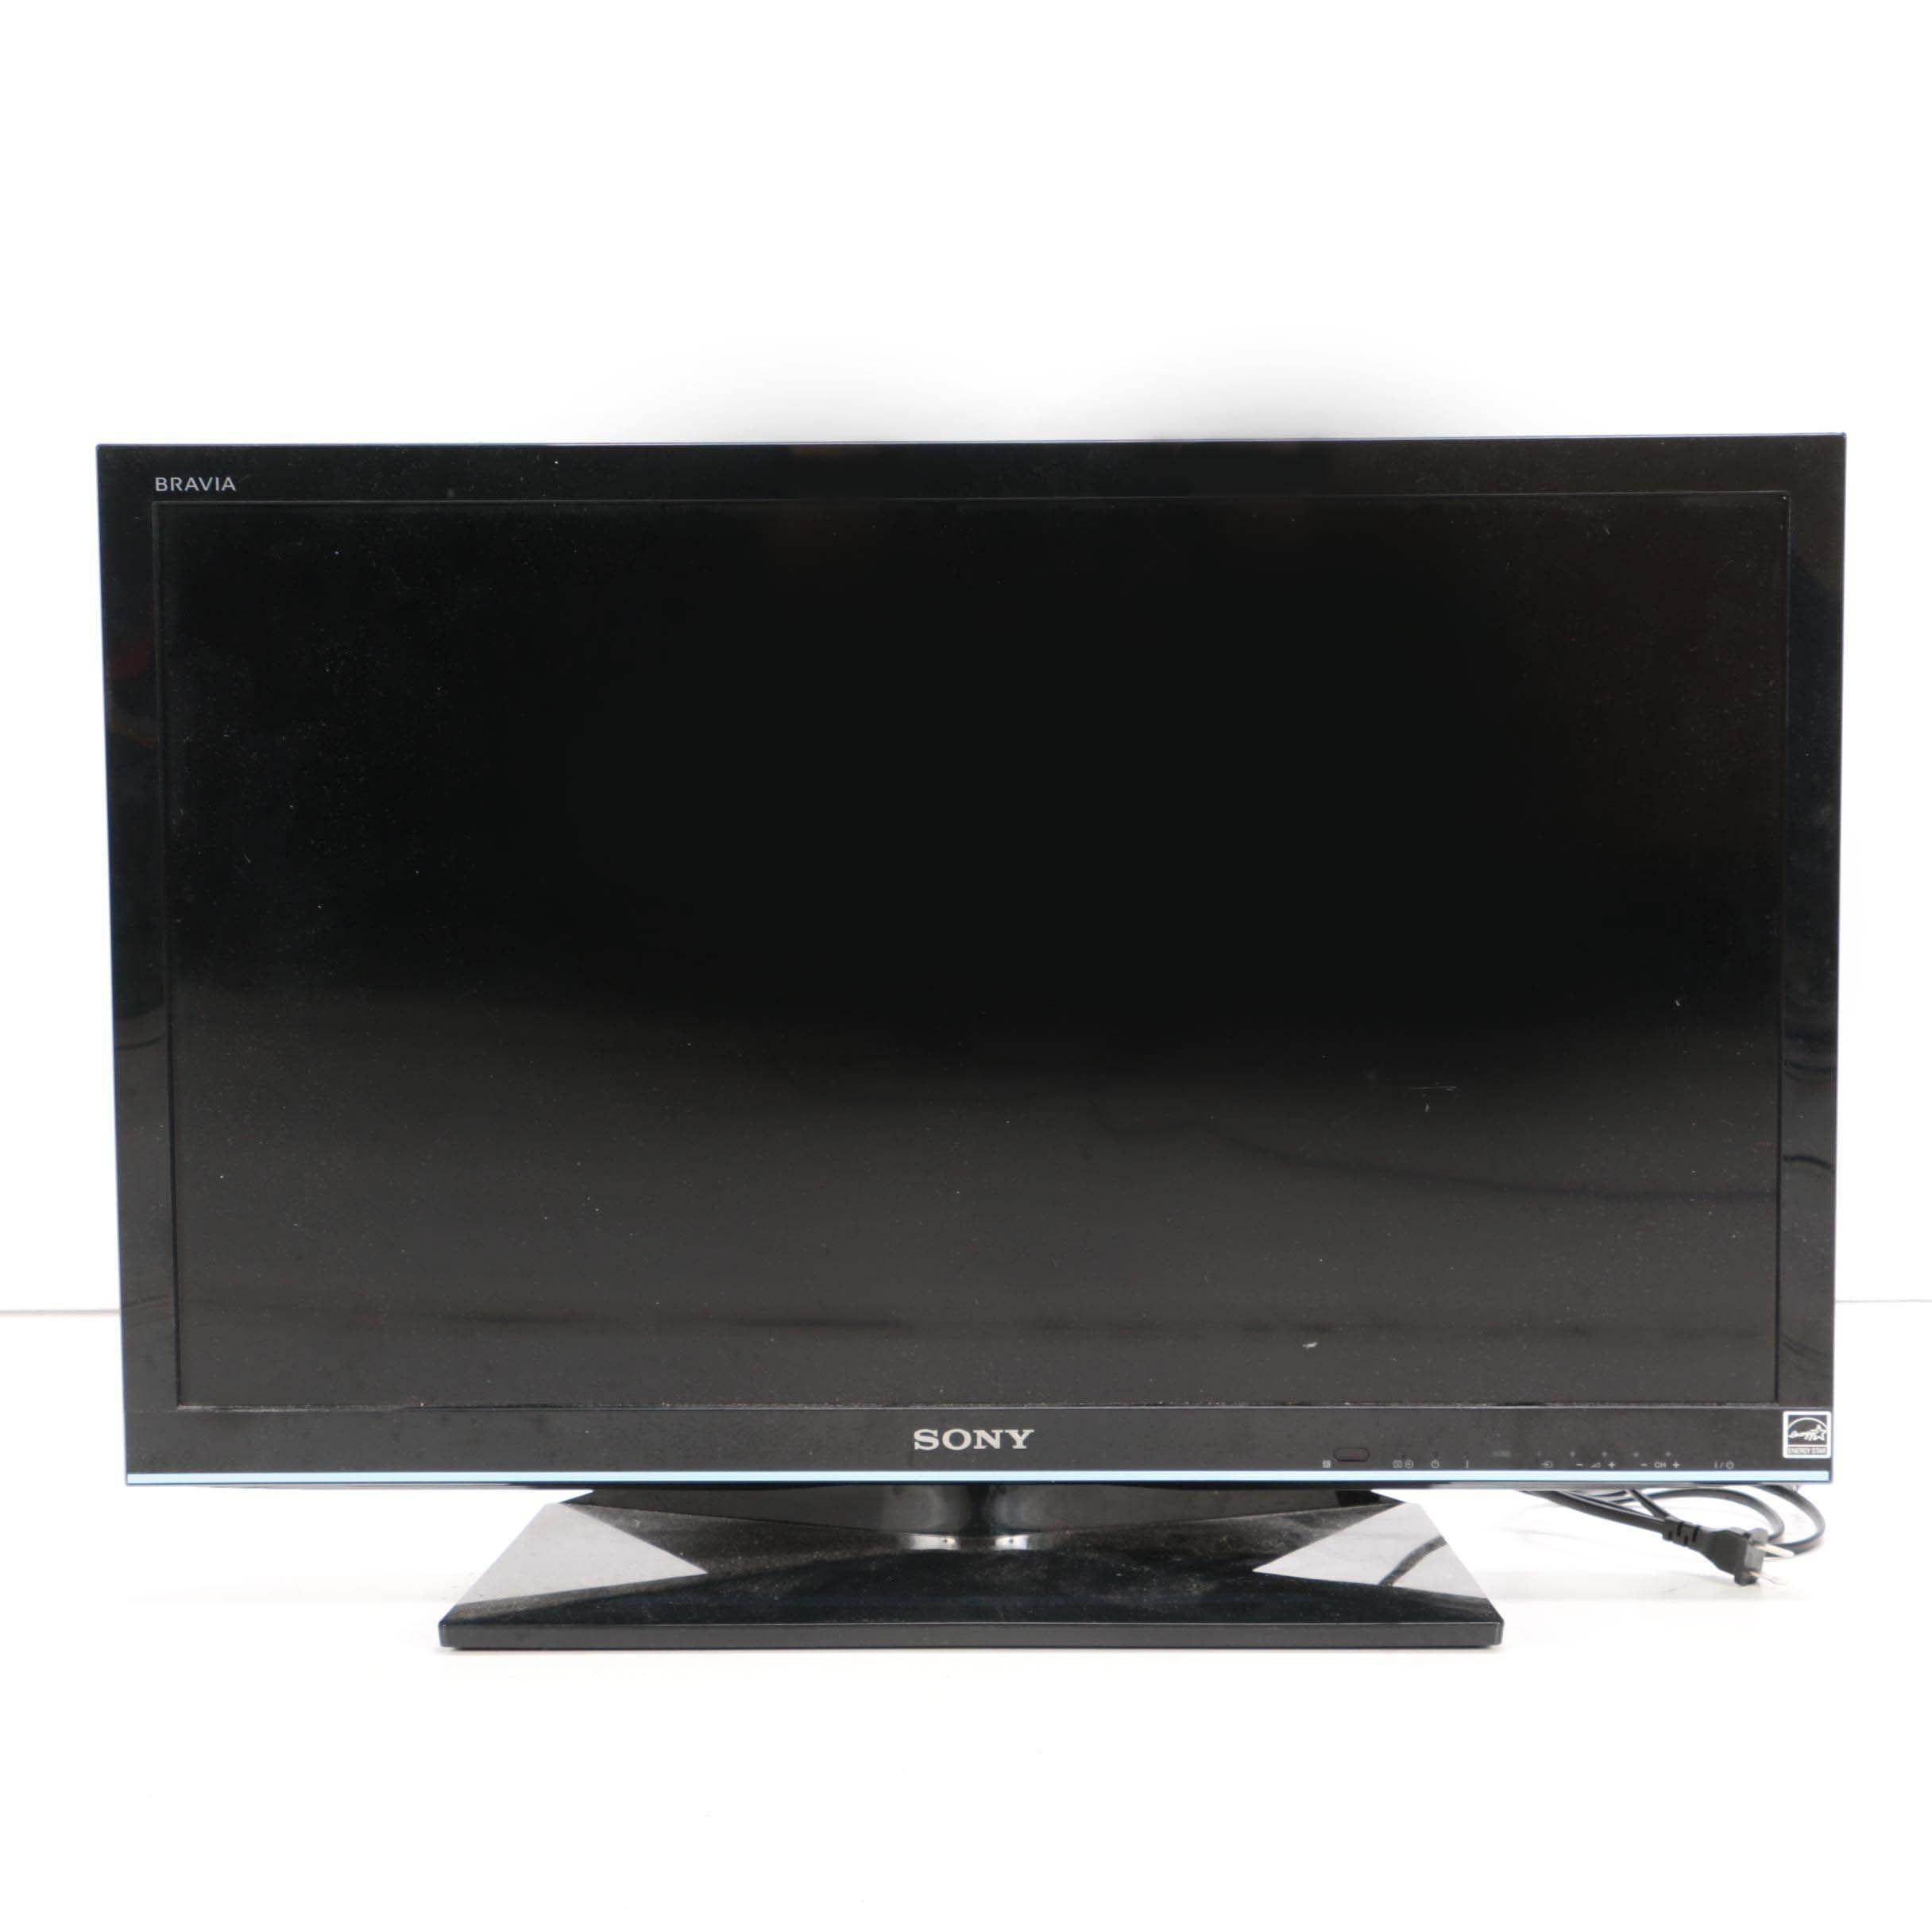 "Sony Bravia 32"" Flat Screen Television"